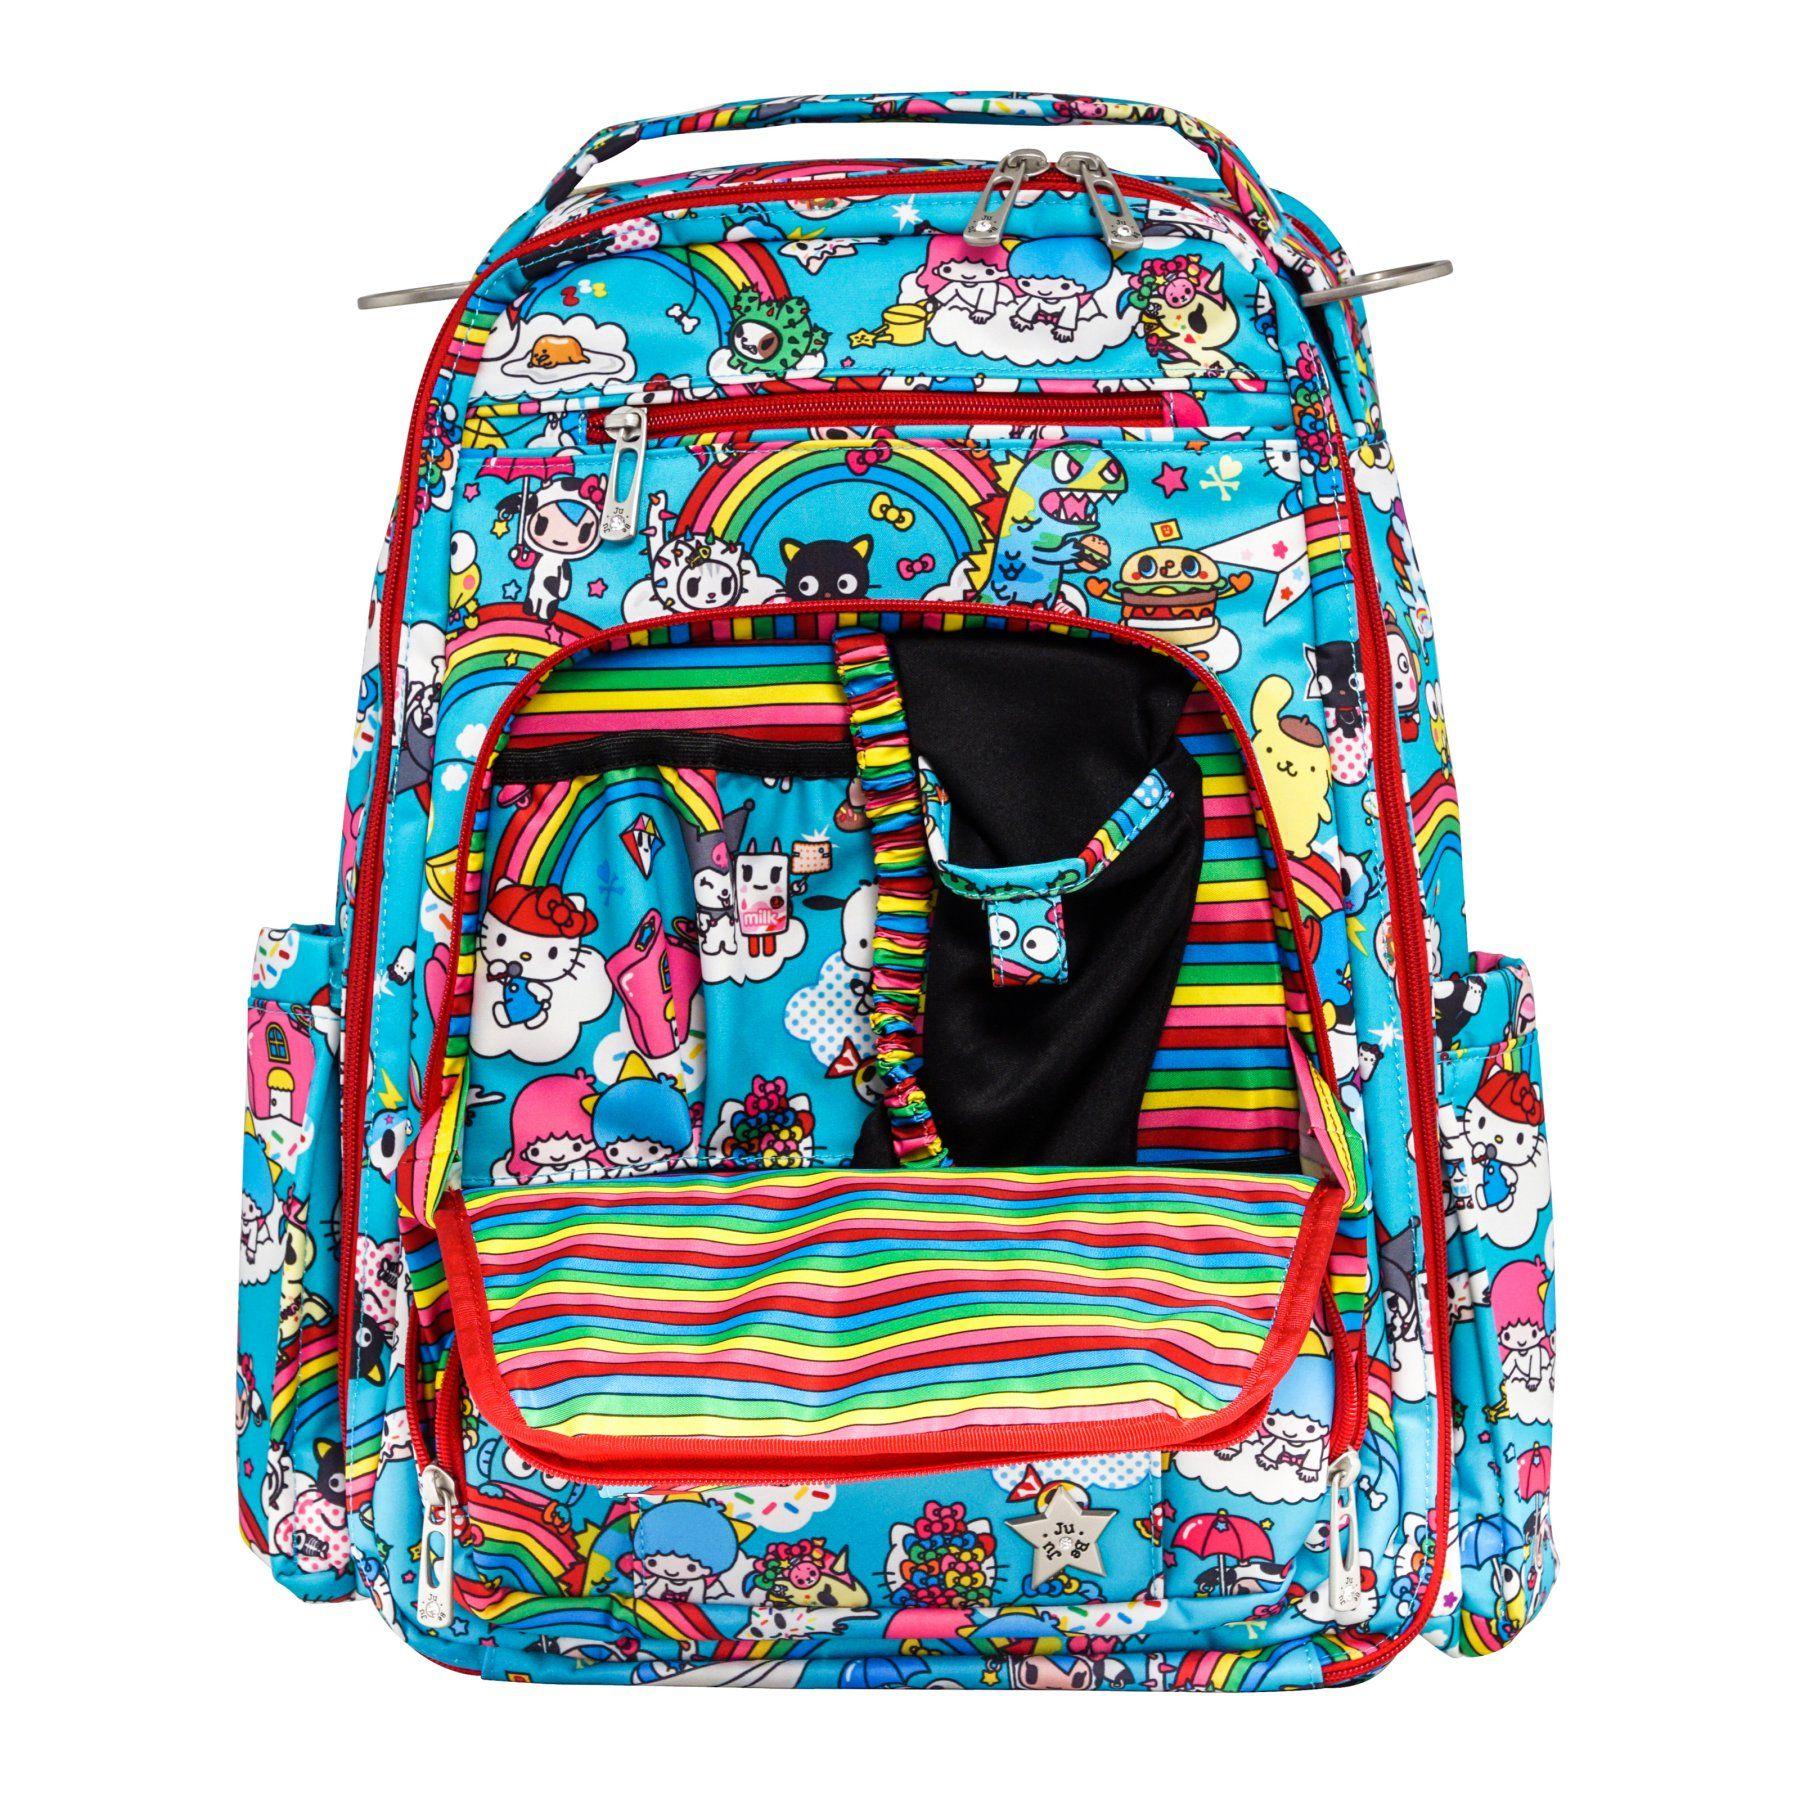 39ac389c8342 Ju Ju Be Tokidoki Collection Be Right Back Backpack Diaper Bag - Rainbow  Dreams - 12BP01AT RBD